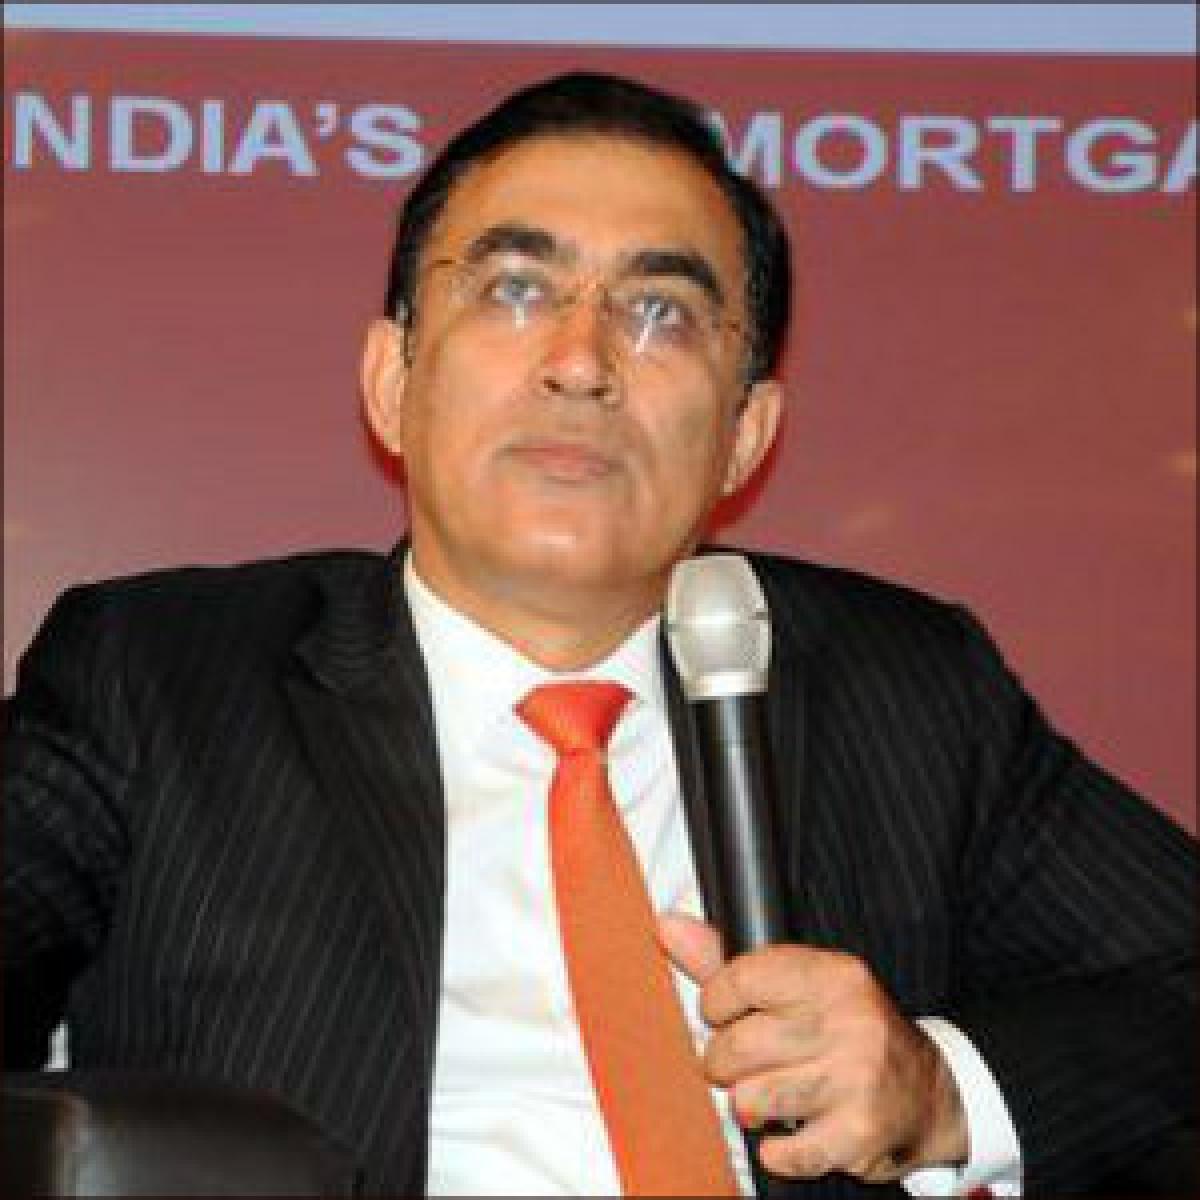 Tata Capital appoints Rajiv Sabharwal as CEO and Managing Director